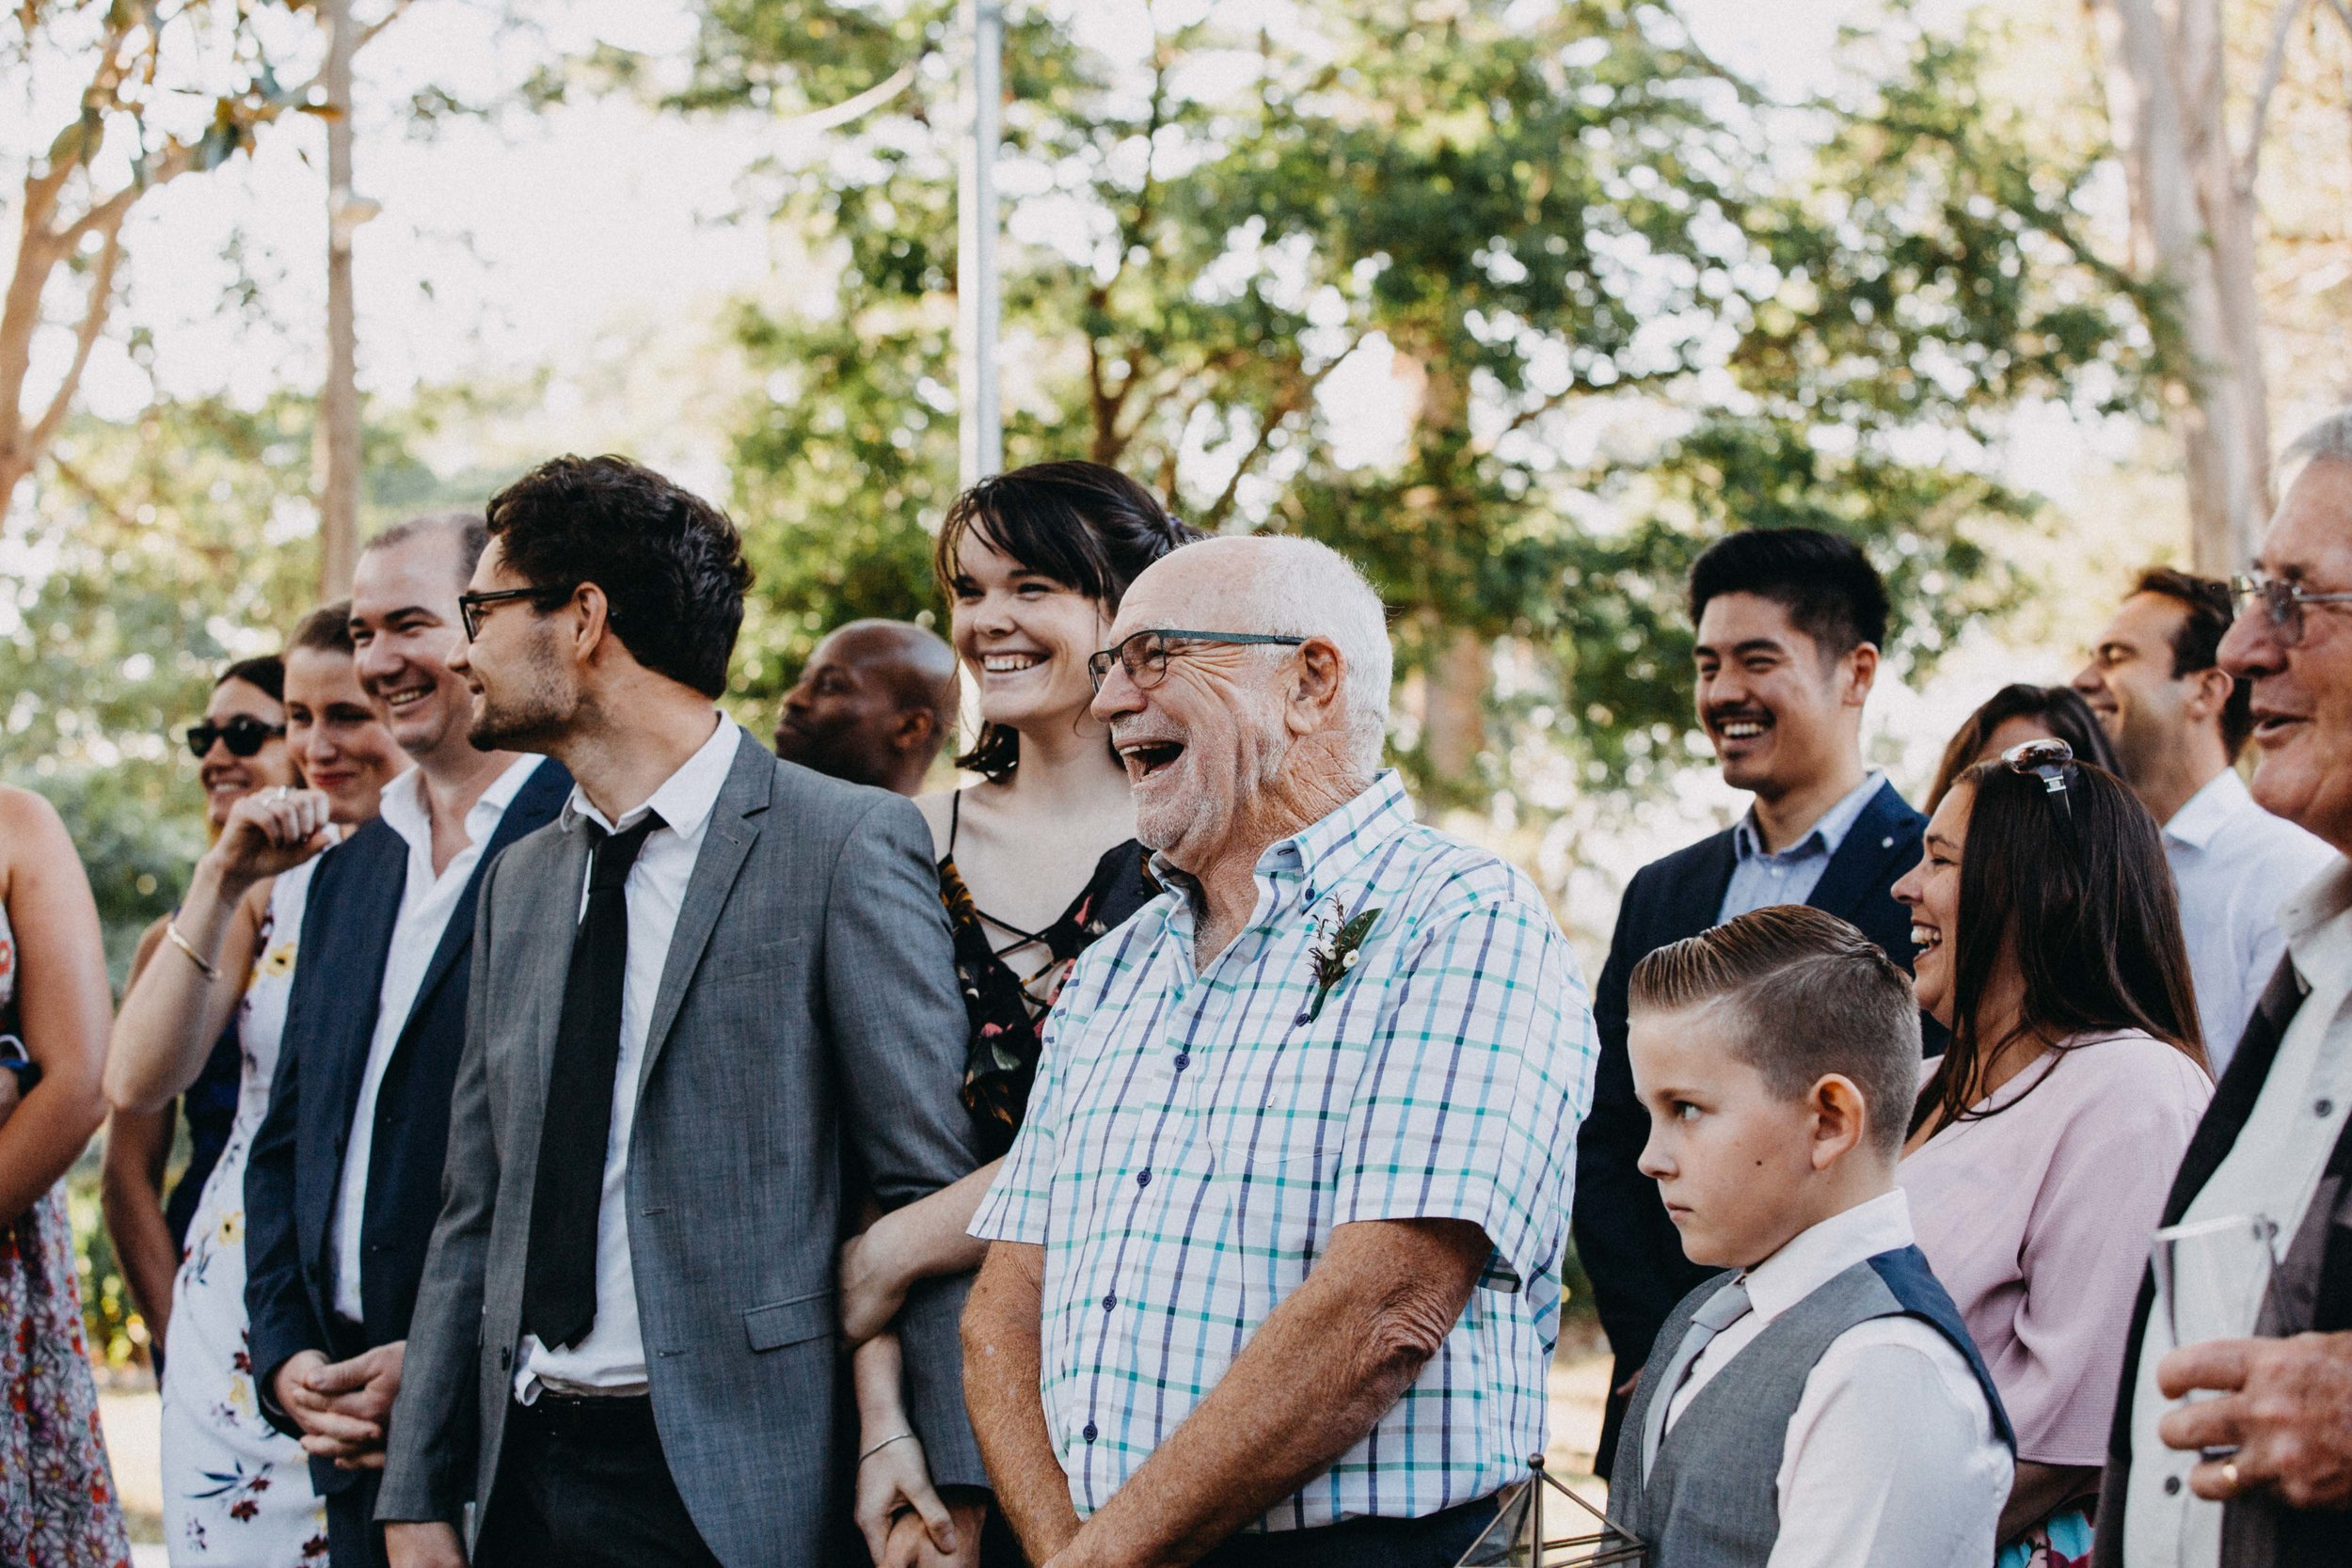 cabarita-park-sydney-wedding-emilyobrienphotography.net-23.jpg